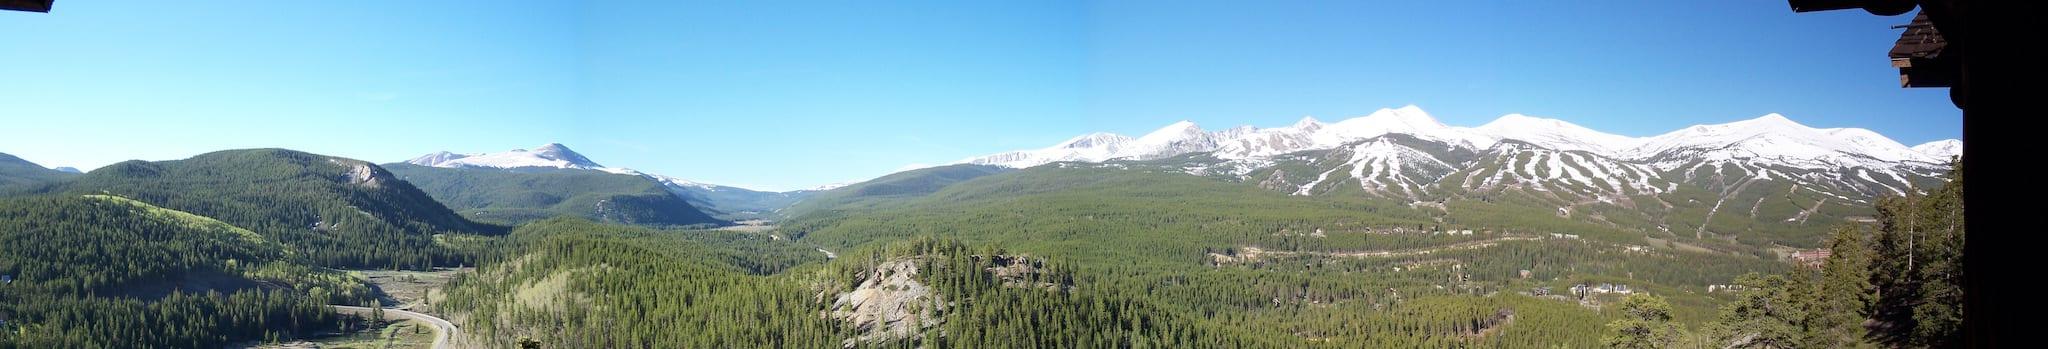 Breckenridge Colorado Spring Panorama